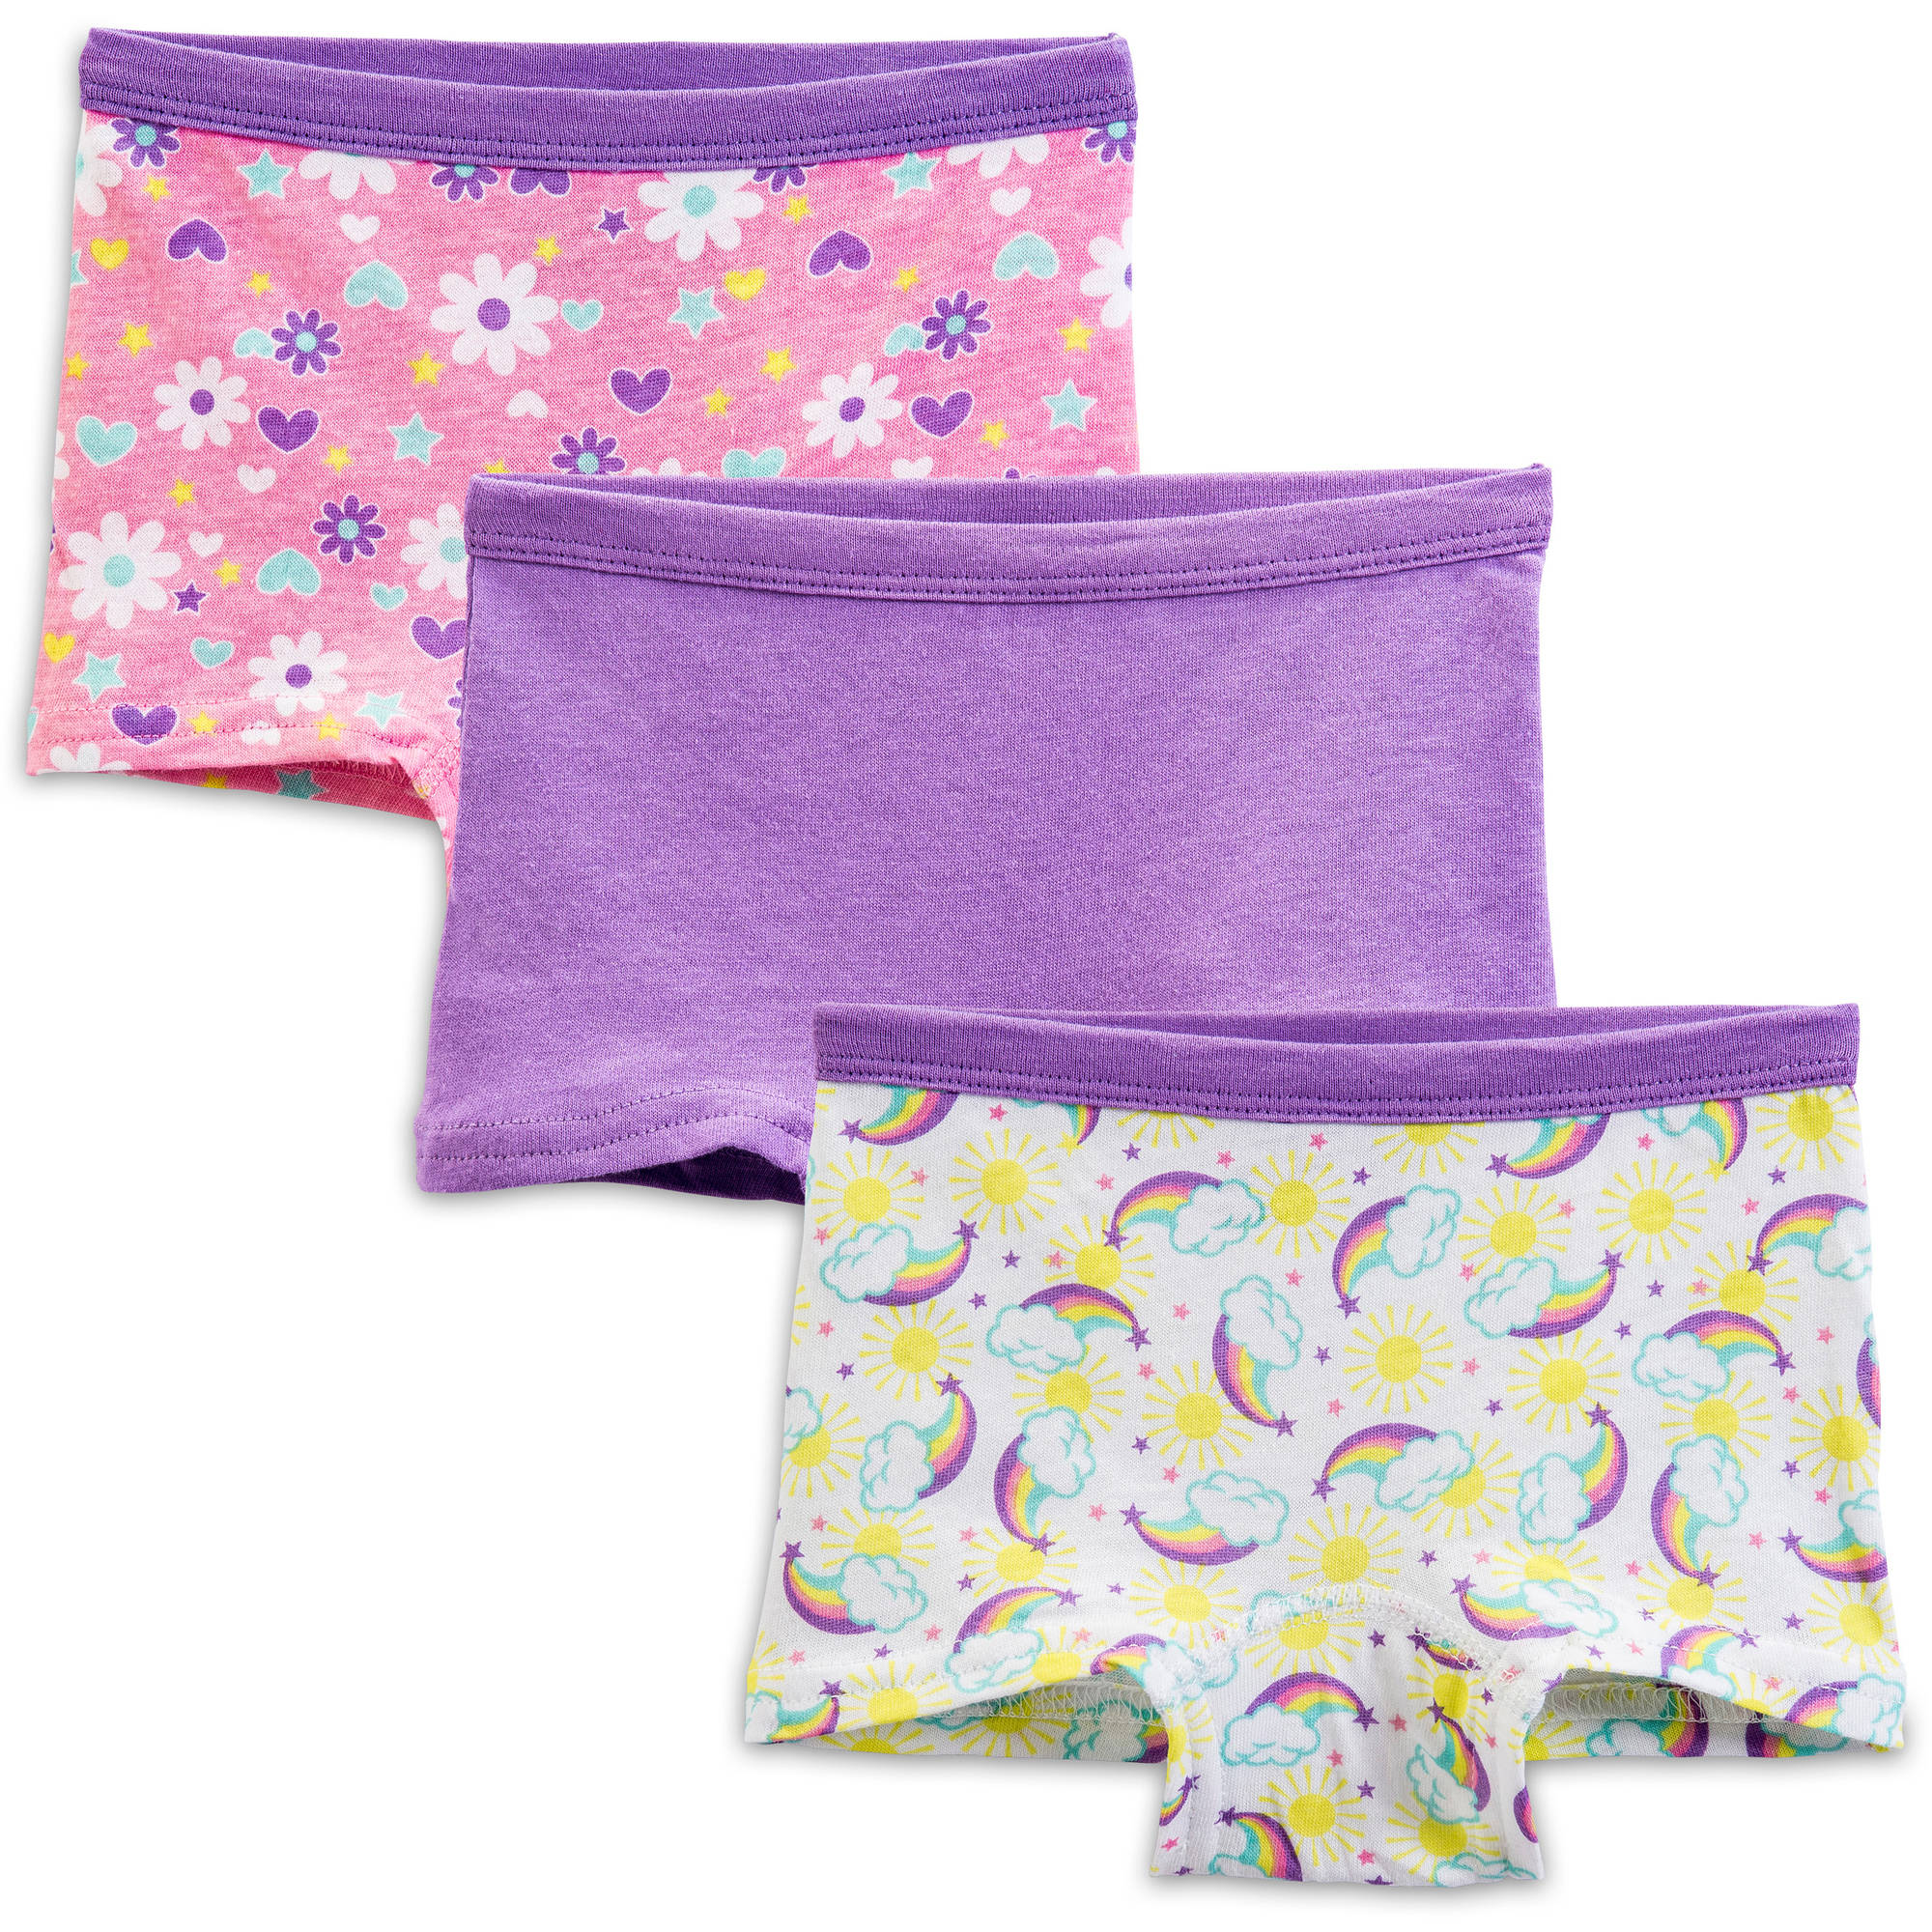 c914dbdc0 Fruit of the Loom - Toddler Girls  Assorted Boy Shorts Panties